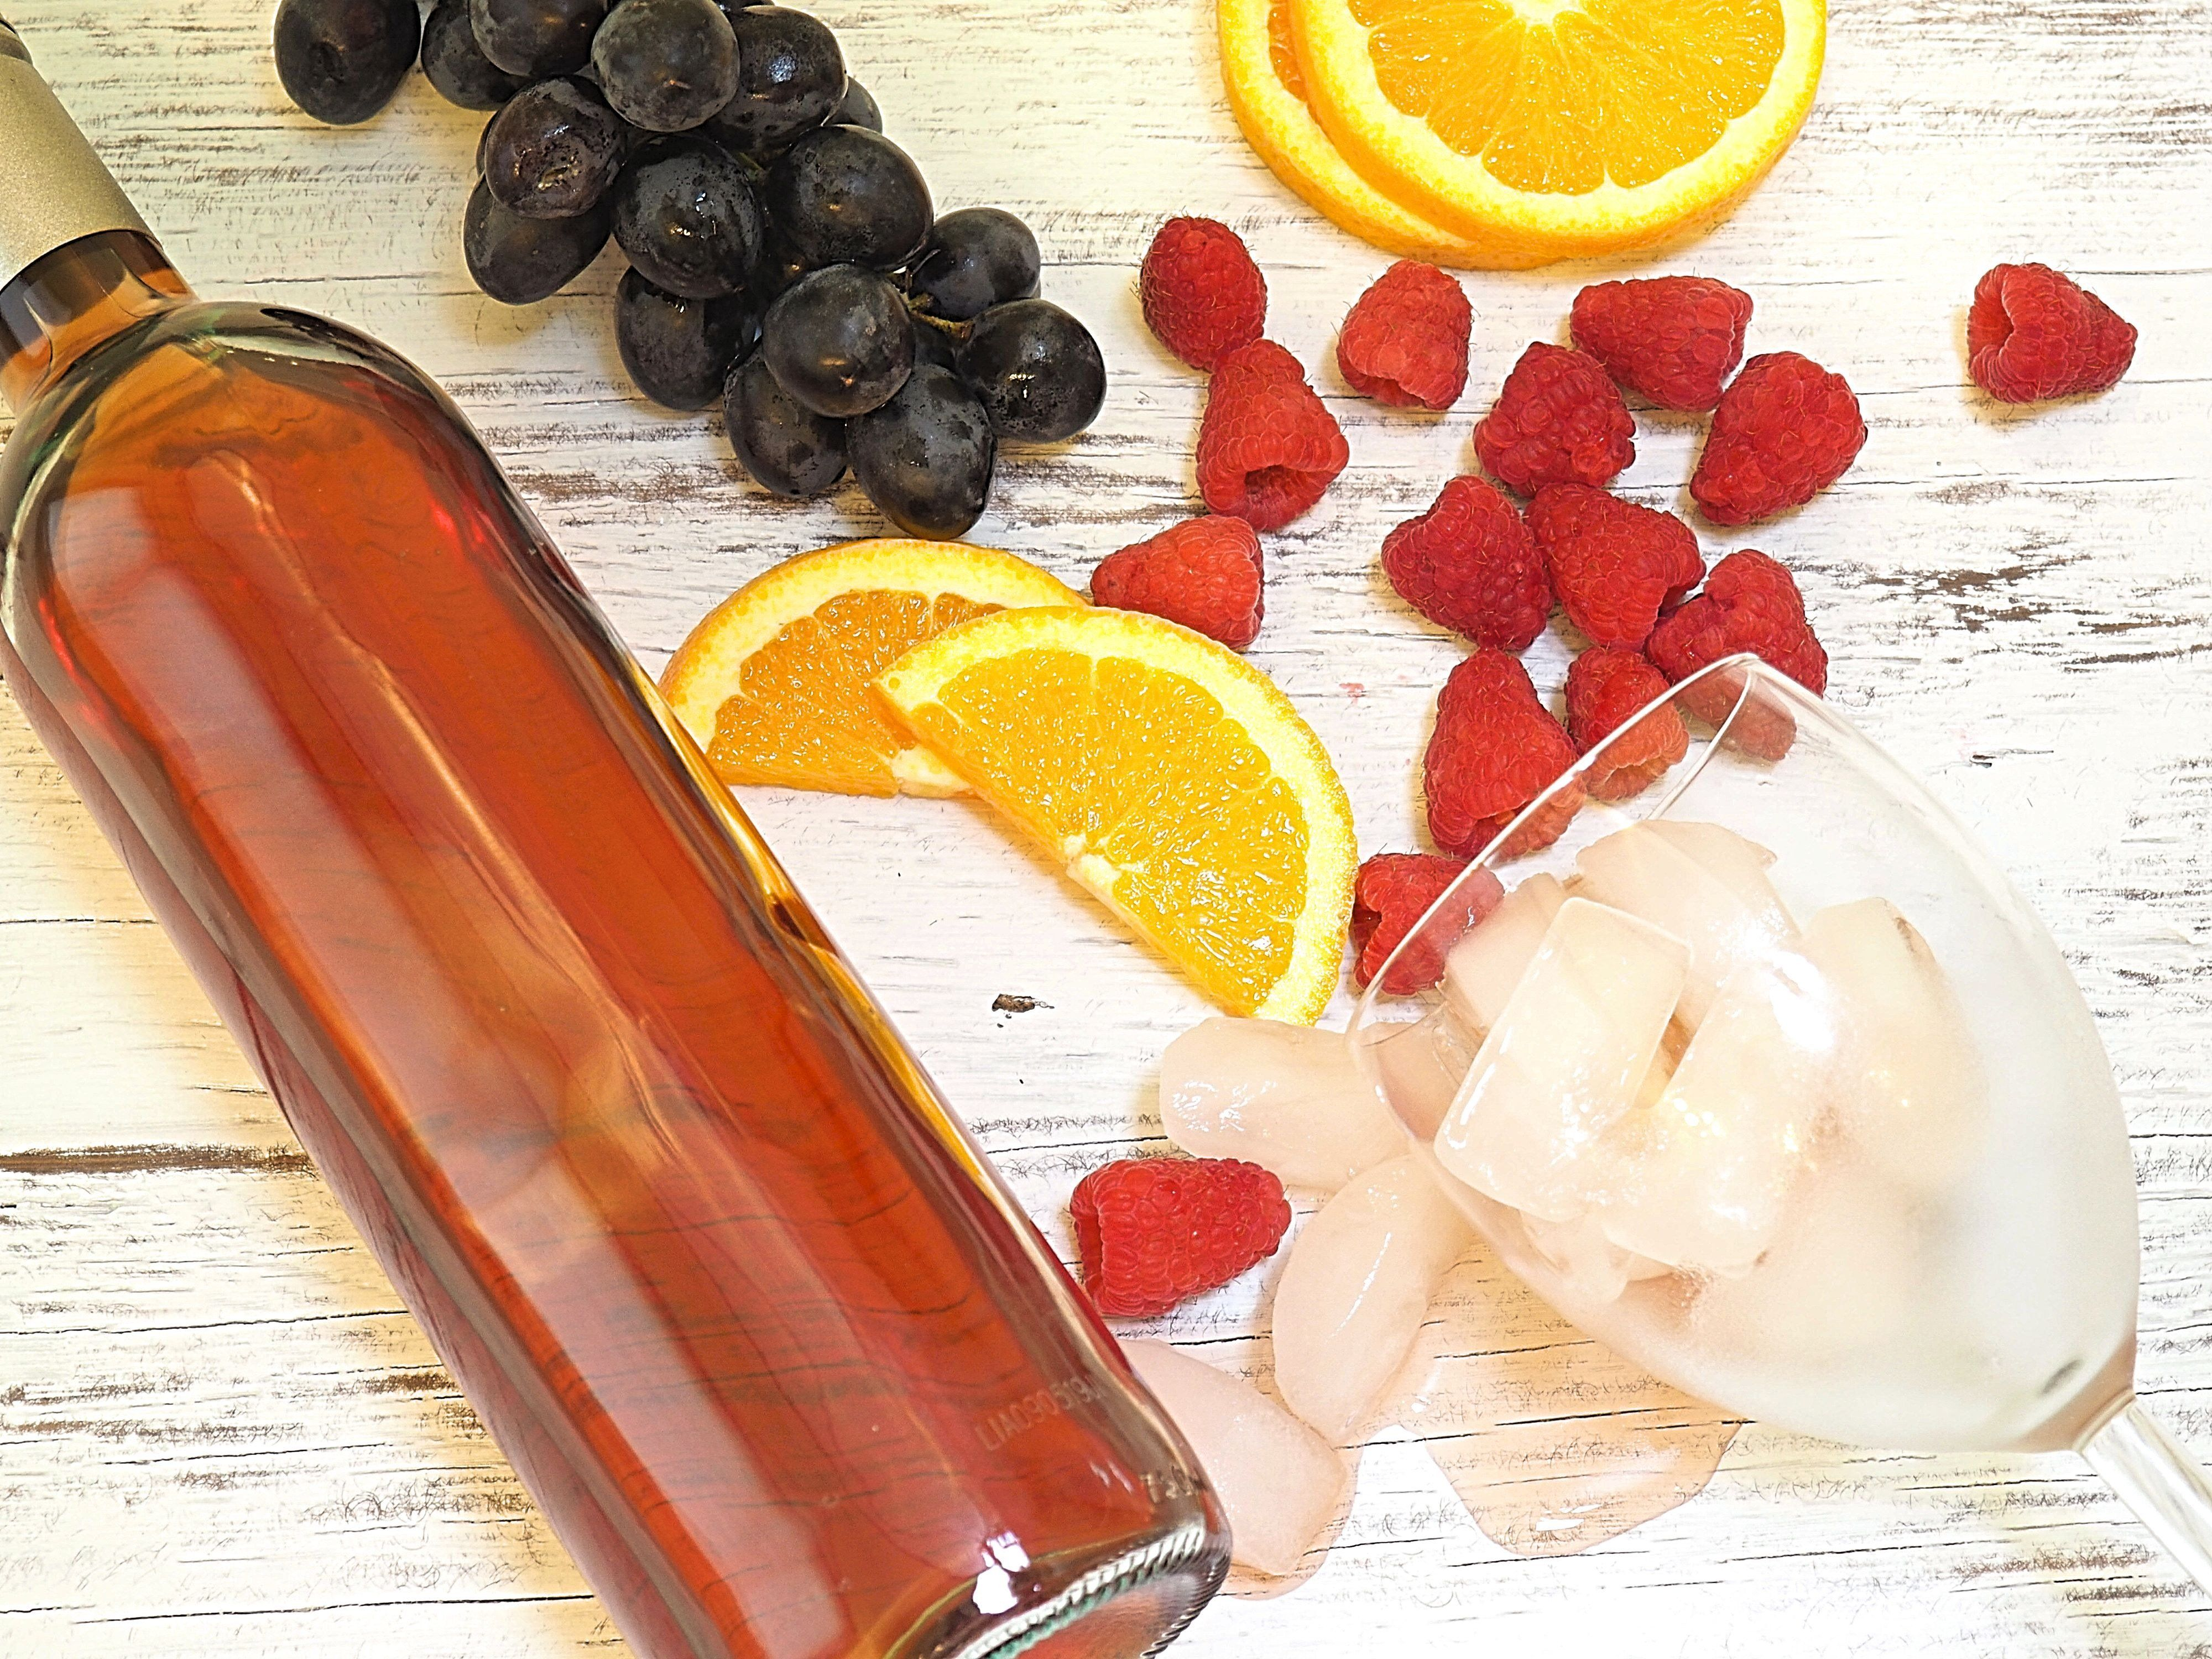 11 Of The Best Fruity Sweet Tasting Wines Under 20 Fruity Wine Sweet Wine List Sweet Red Wines